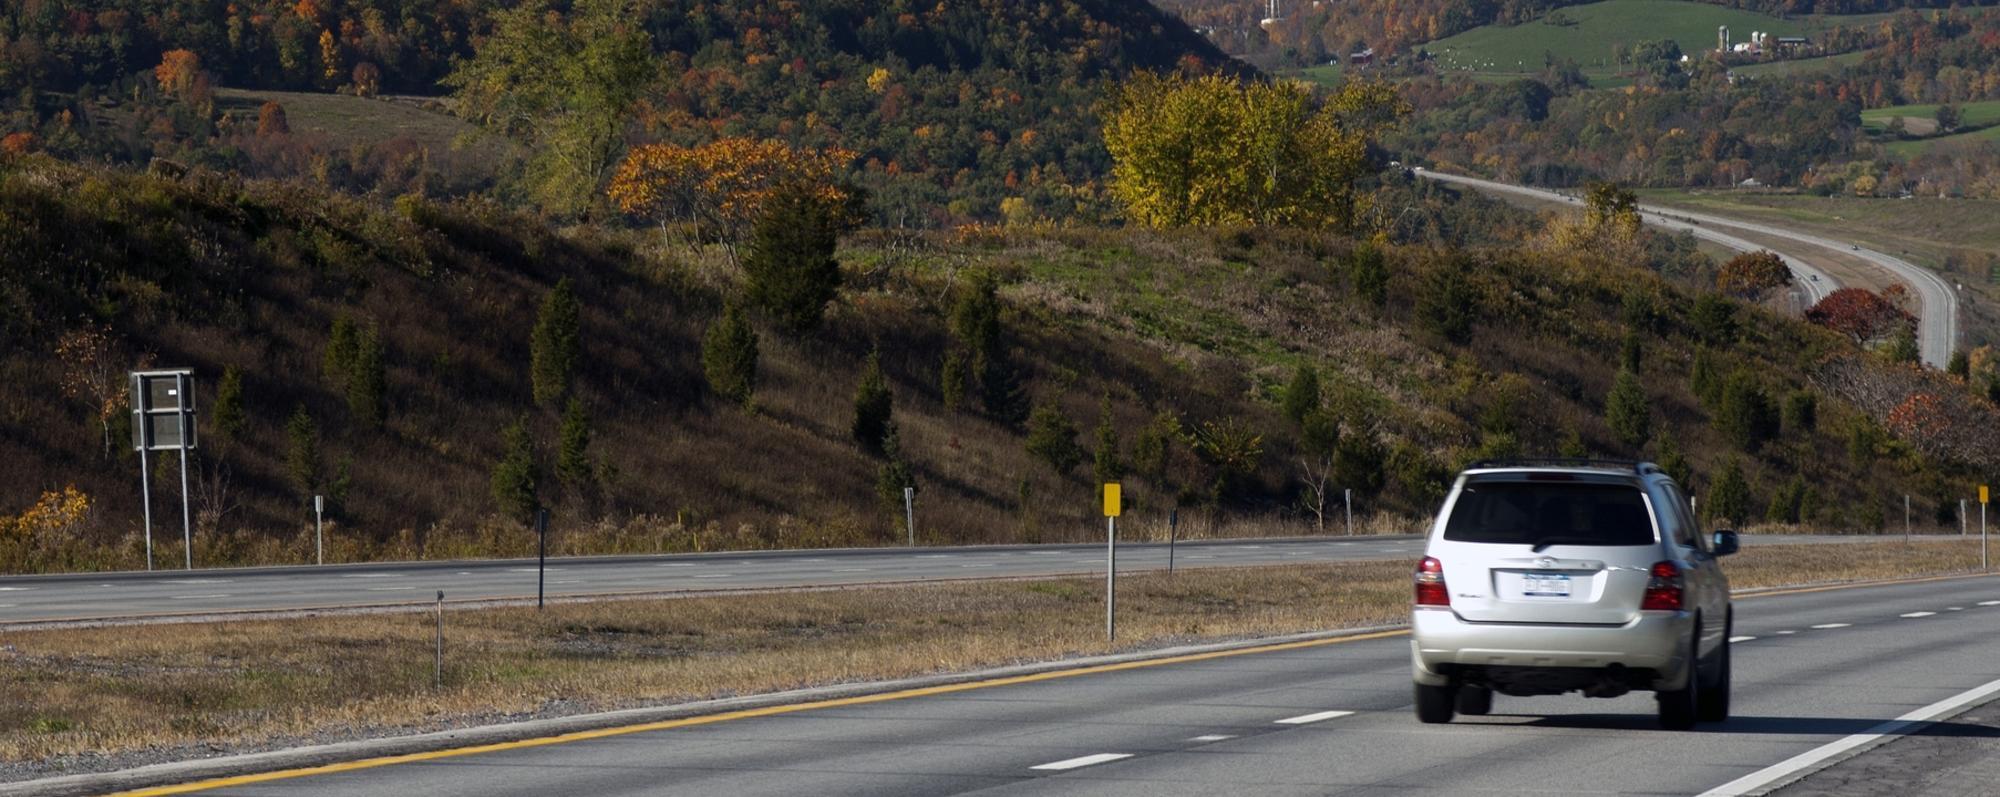 Seasons Fall - Driving Tours